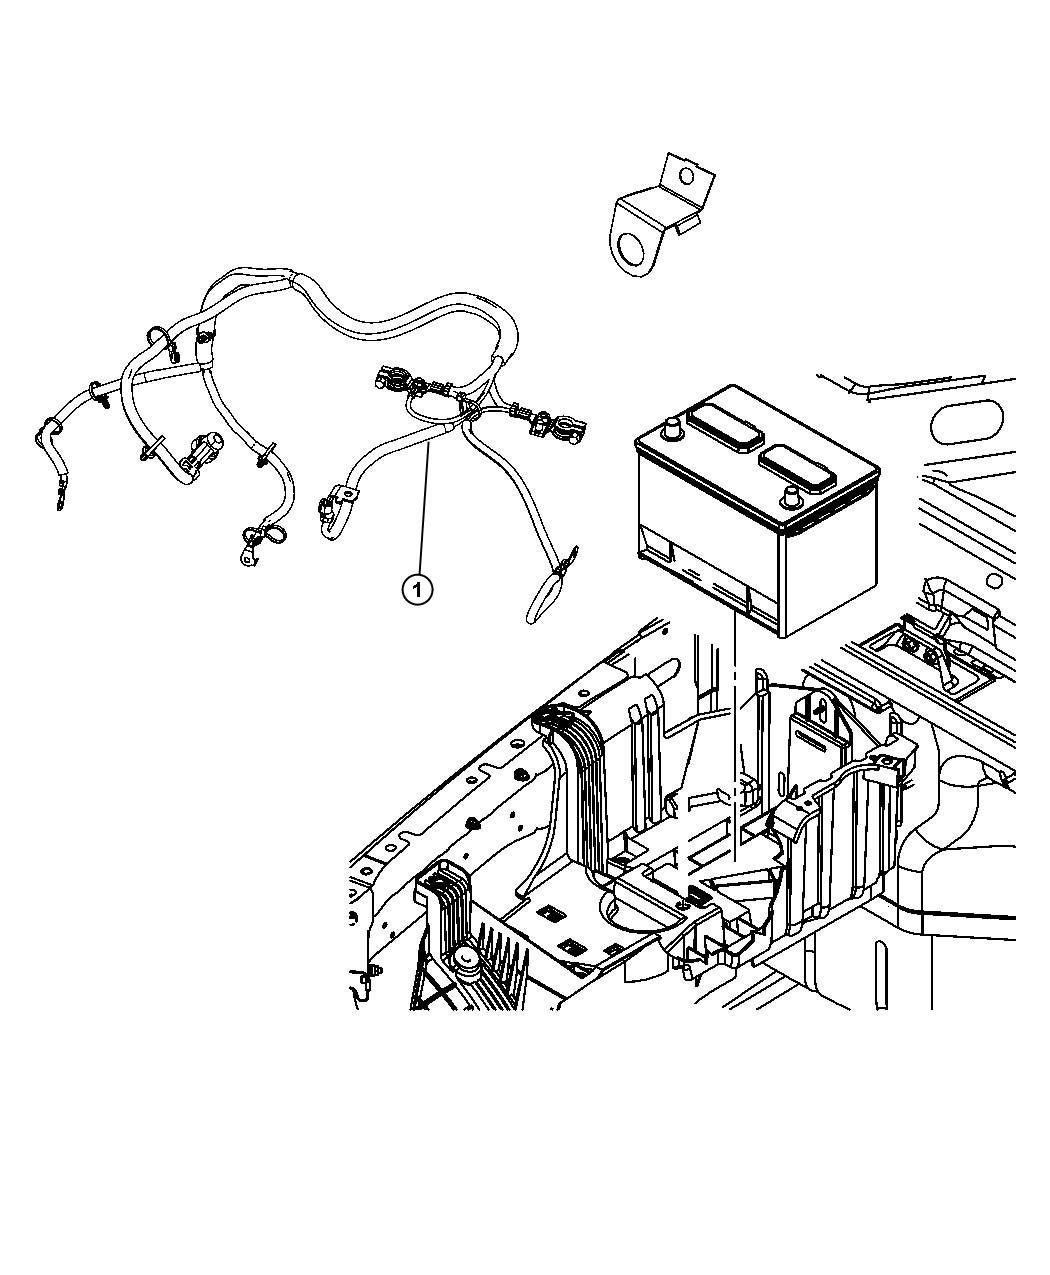 Wiring Battery Diagram 8